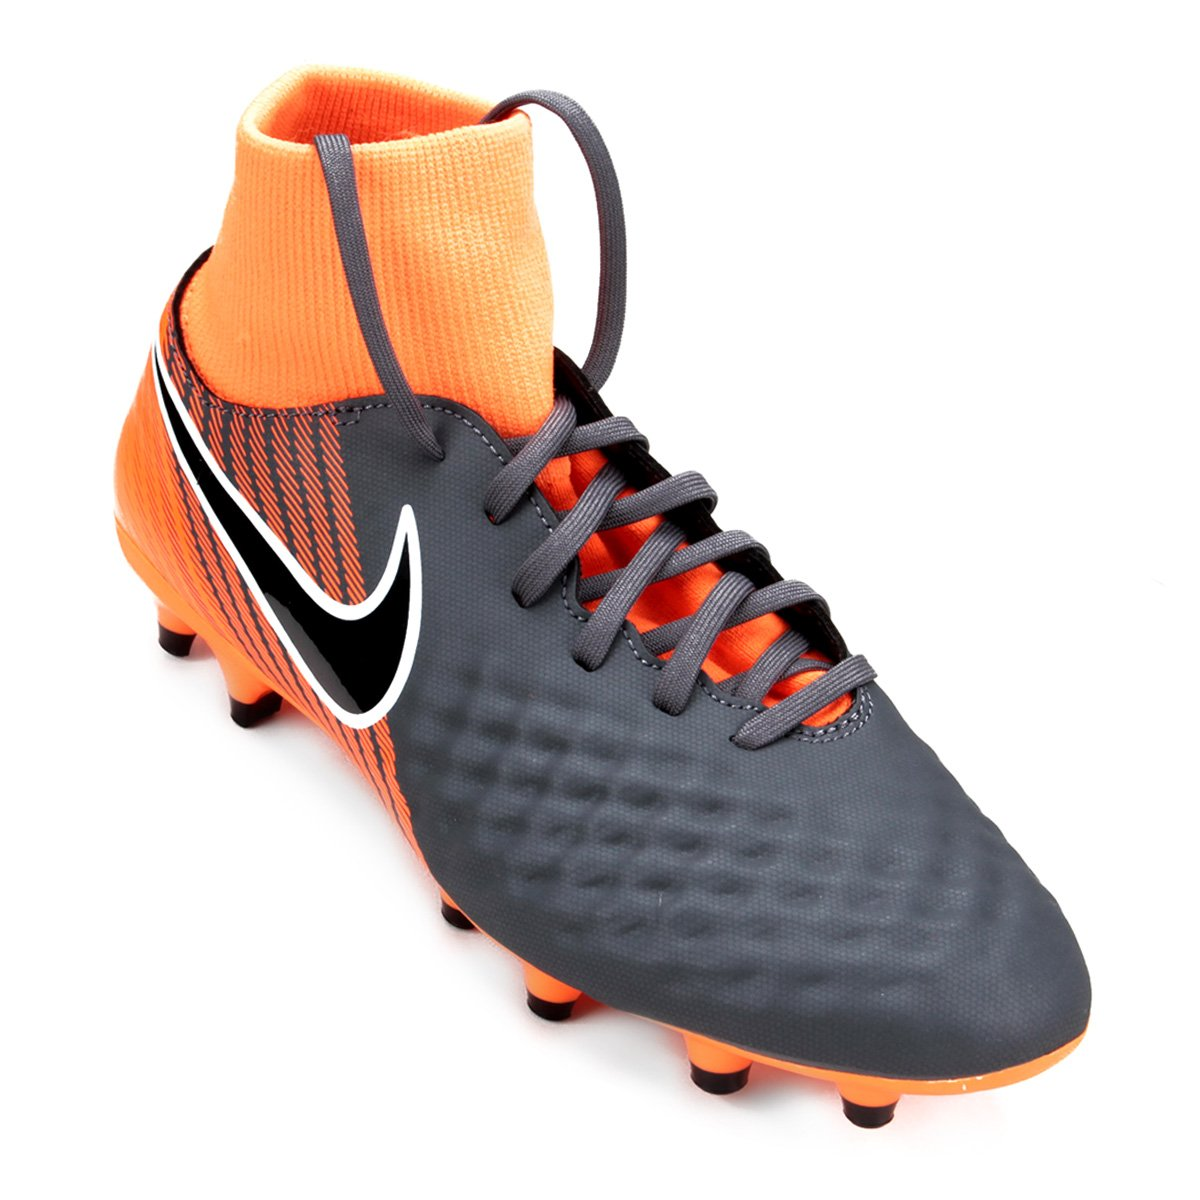 a2dddd85fd ... in stock Chuteira Campo Nike Magista Obra 2 Academy DF FG Masculina -  Cinza+Preto ...